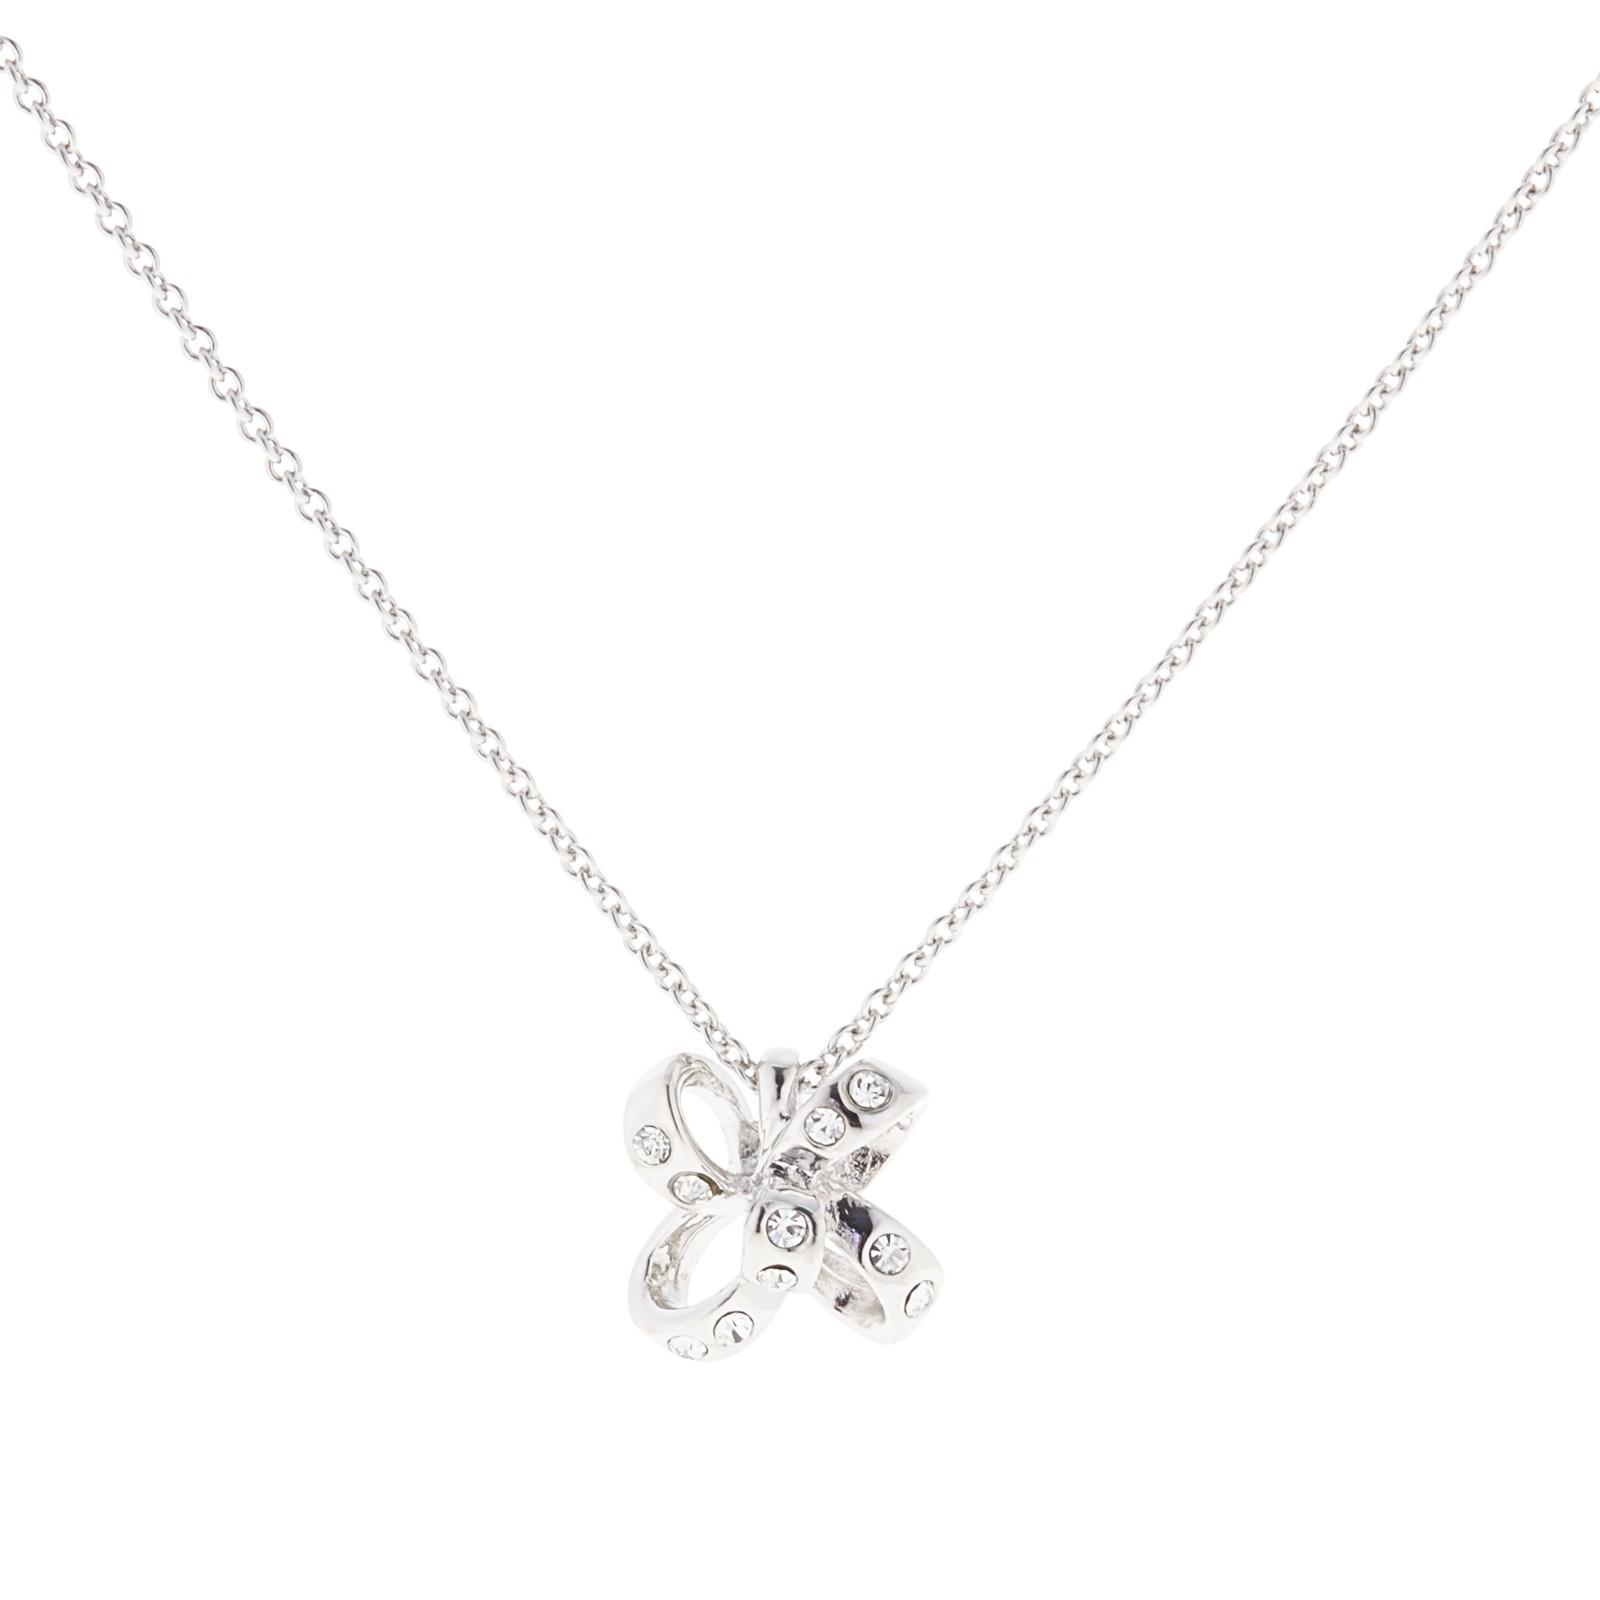 Kate Spade Crystal Mini Bow Pendant Necklace in Metallic